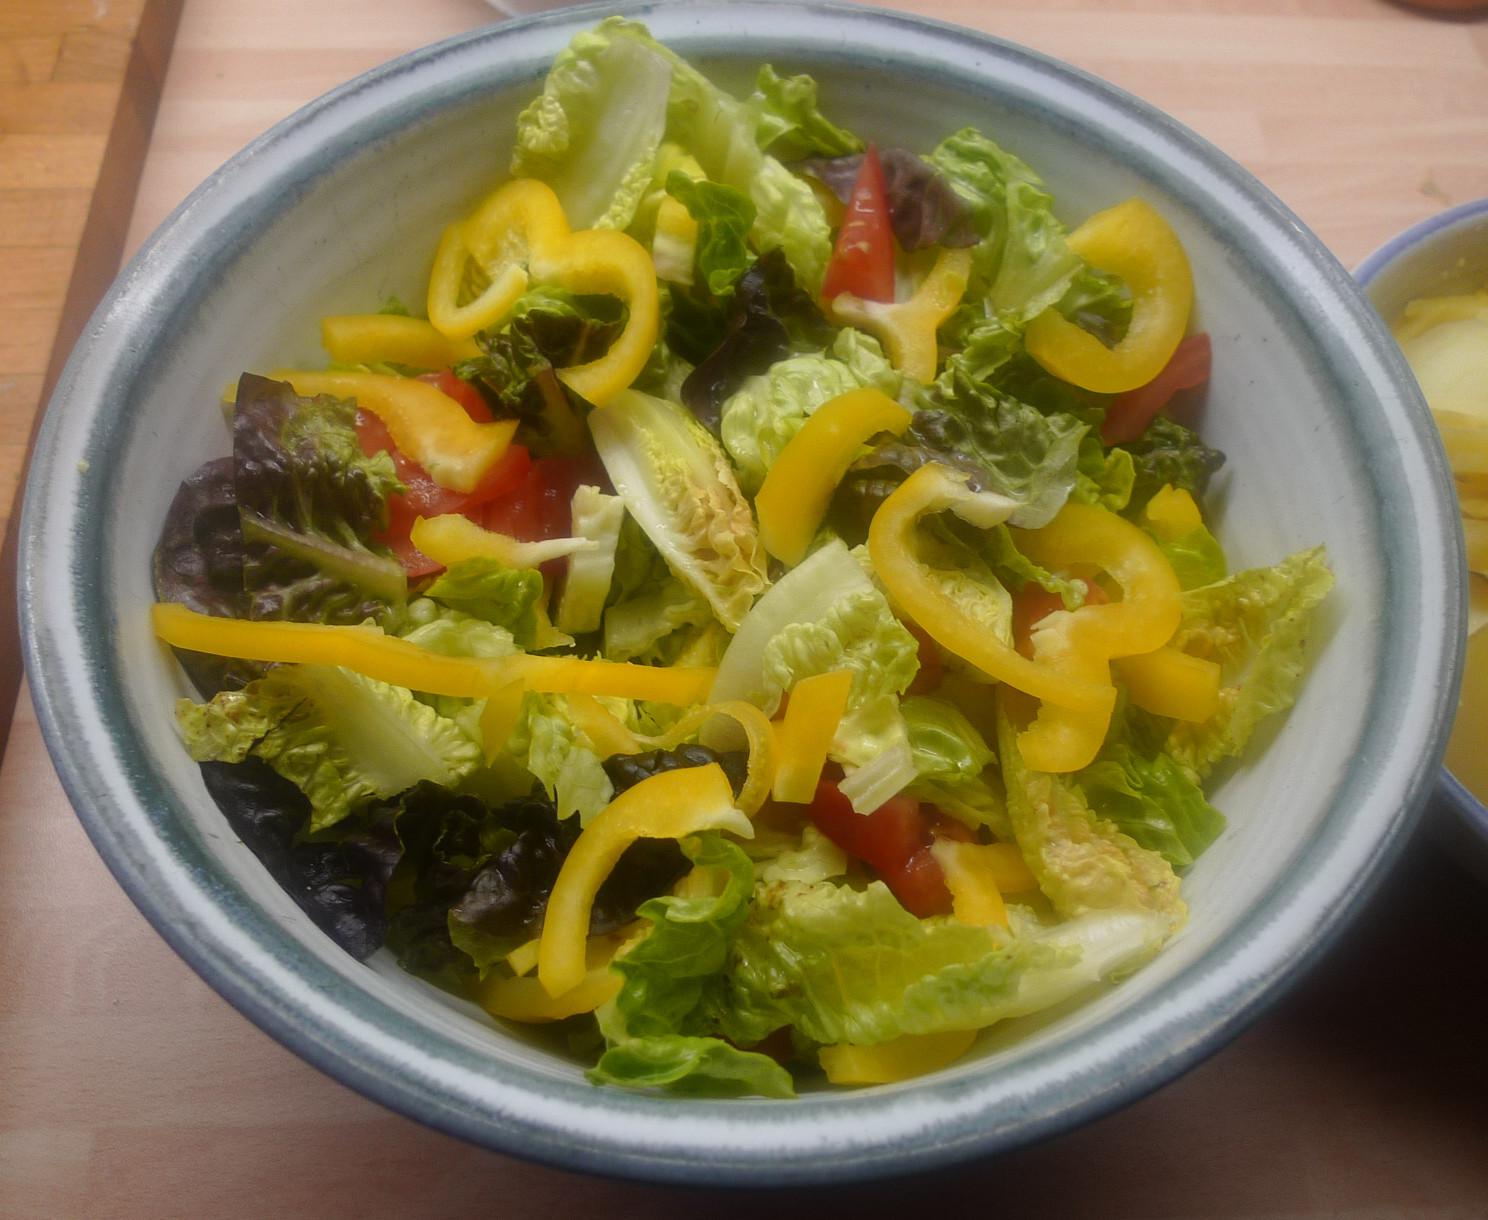 Guacamole,Fenchelsalat,Salat,Bratkartoffel--22.1.15   (5)